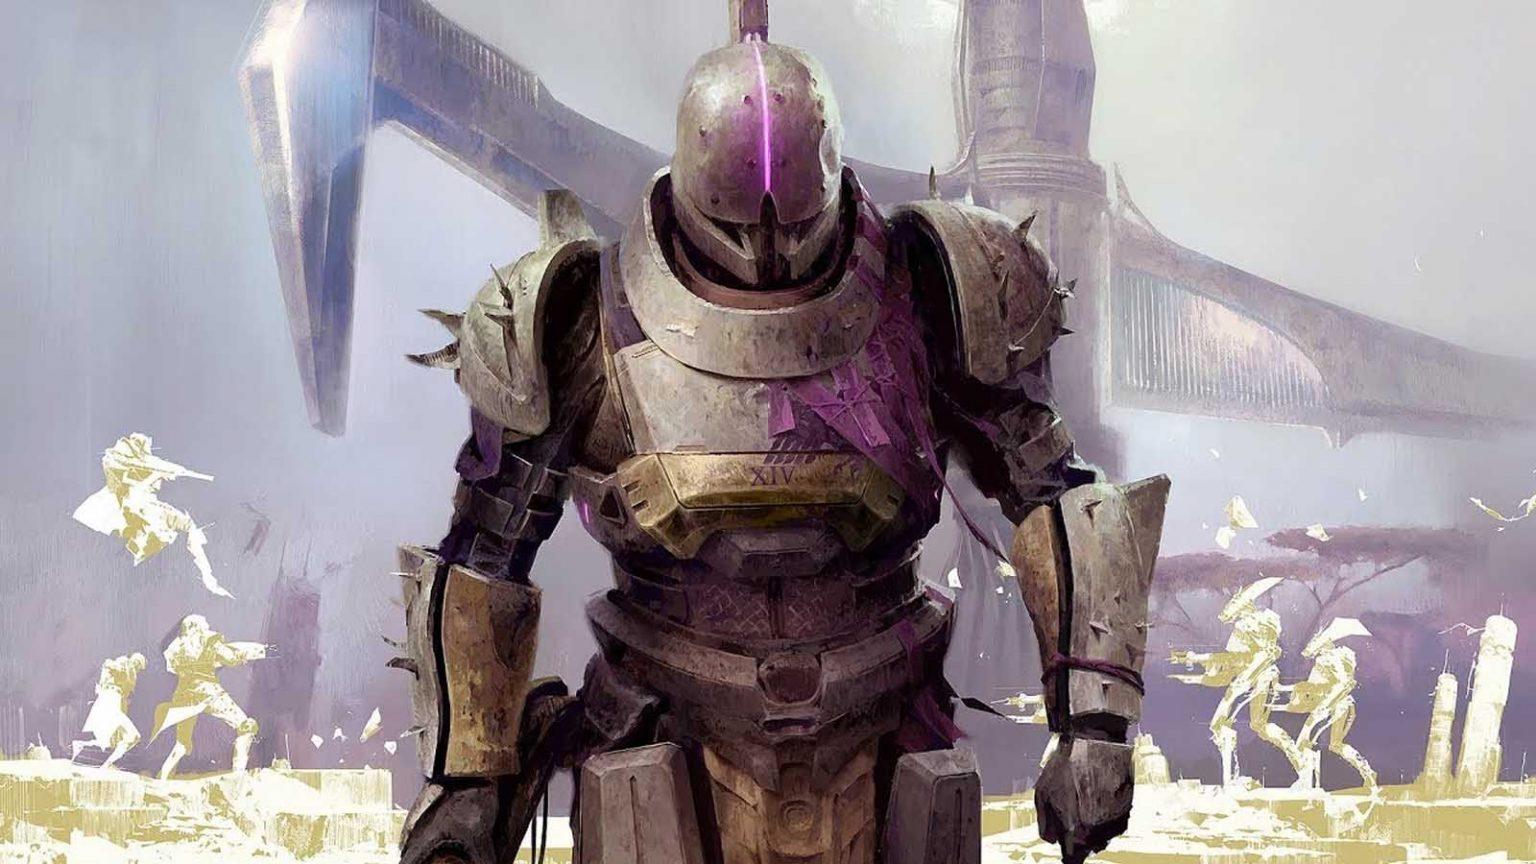 destiny 2 titan lost sector destiny 2 essence of pride 2020 03 29 destiny 2 titan lost sector destiny 2